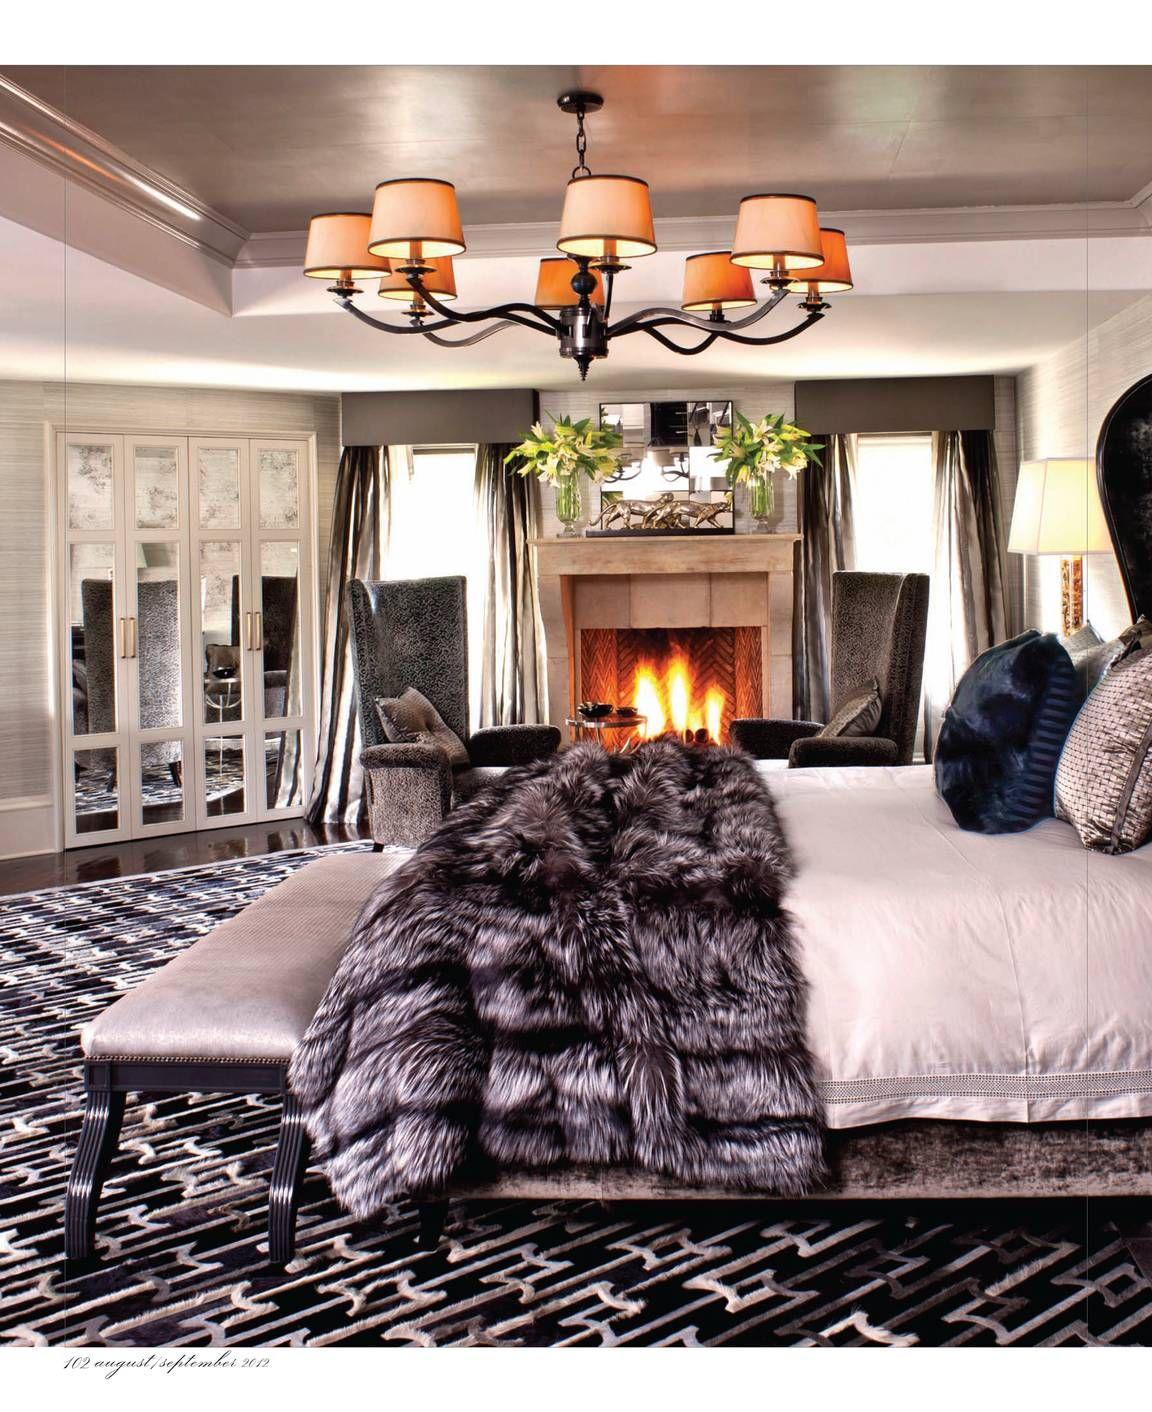 Kris Jenner Bedroom Decor Interiors August September 2012 Page 102 Transitional